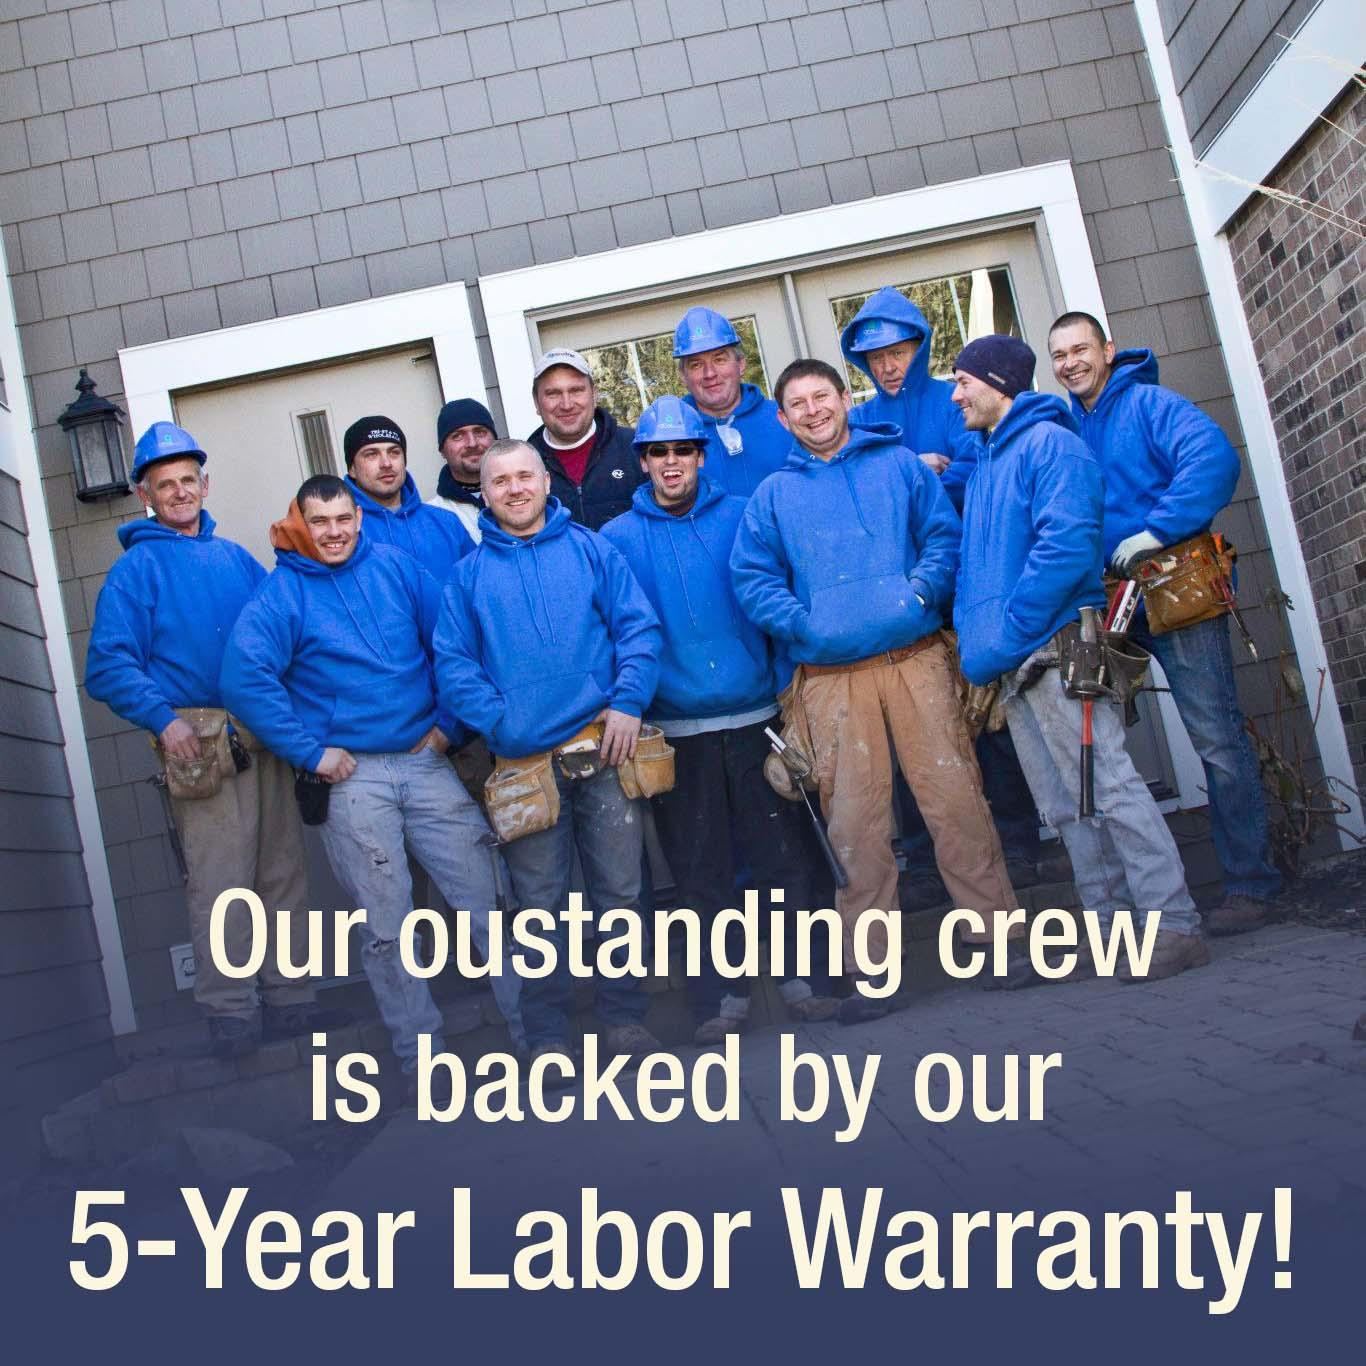 1366 #064DBC Opal Enterprises Inc In Naperville IL Whitepages picture/photo Provia Doors Dealers 46291366